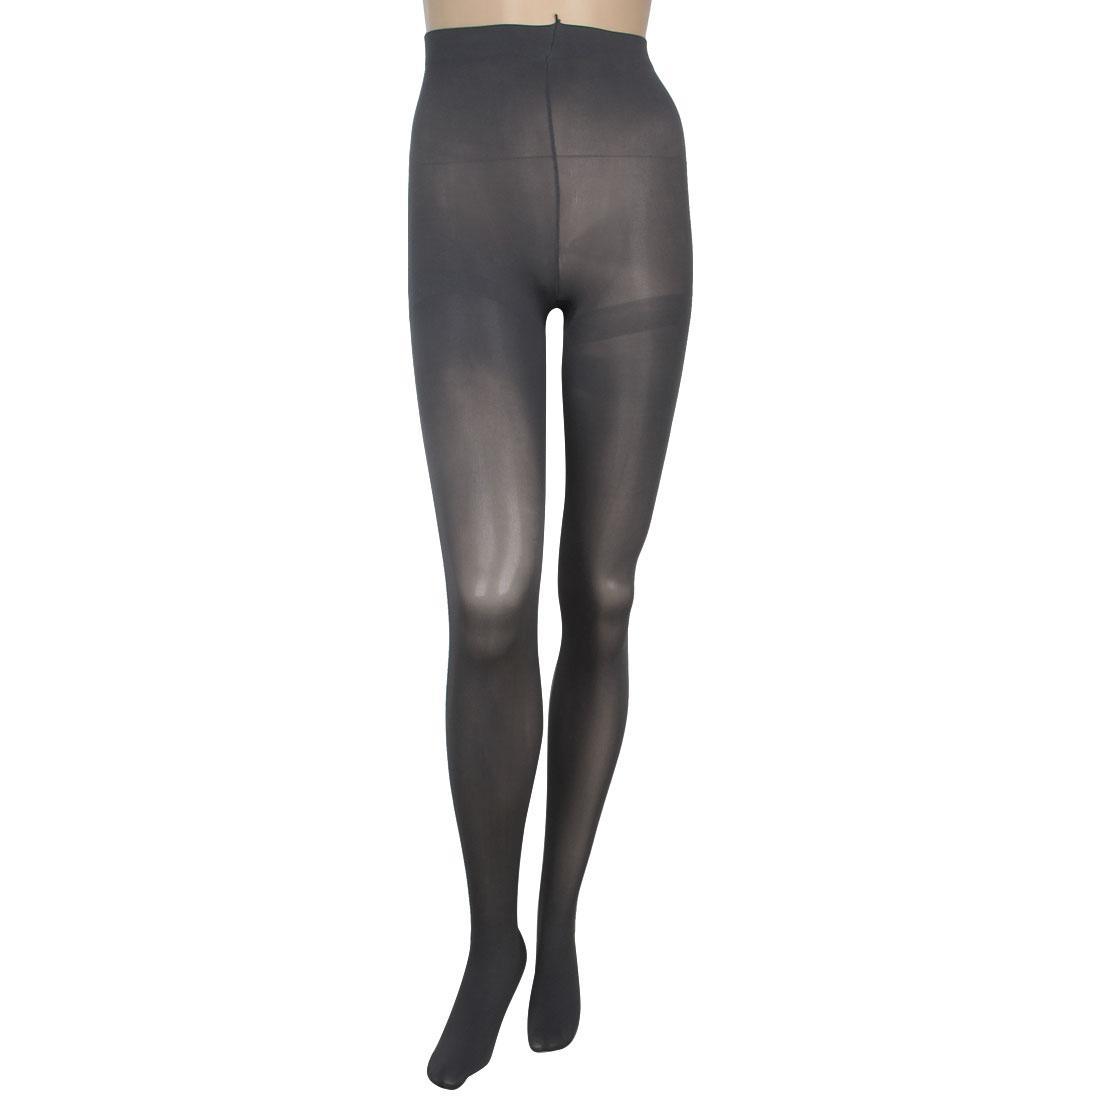 Dark Gray Thicken Formfitting Tights Leggings Pantyhose for Women XS